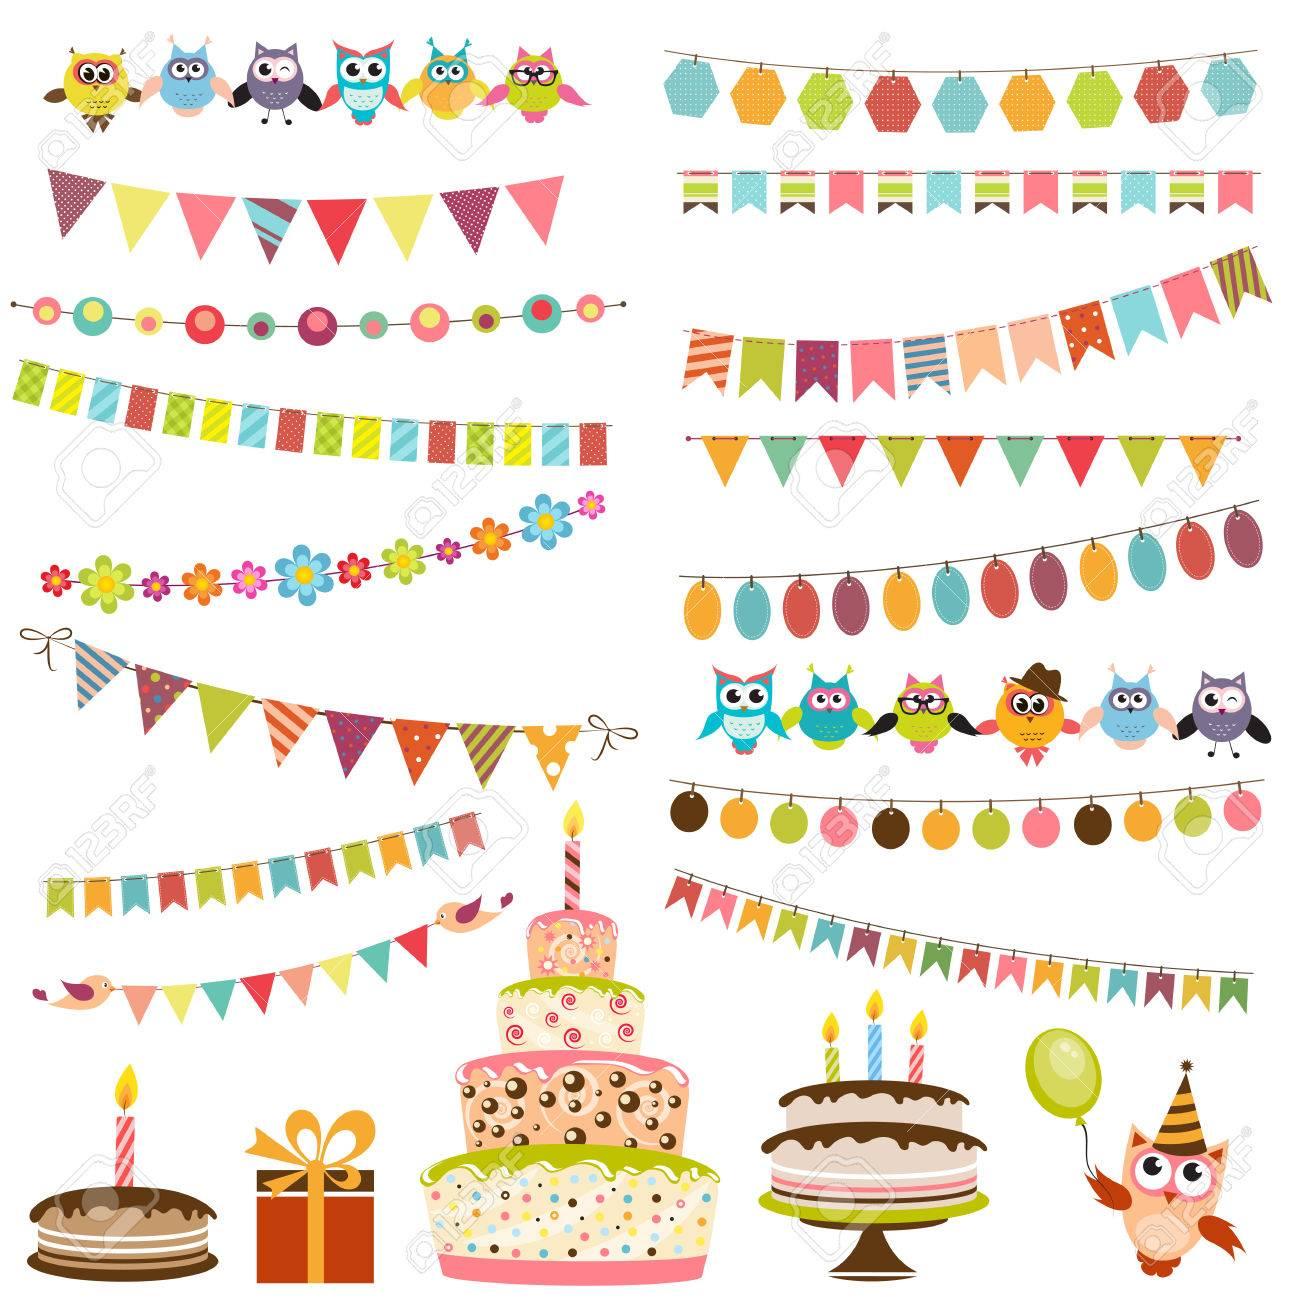 Color Birthday bunting set - 53140152